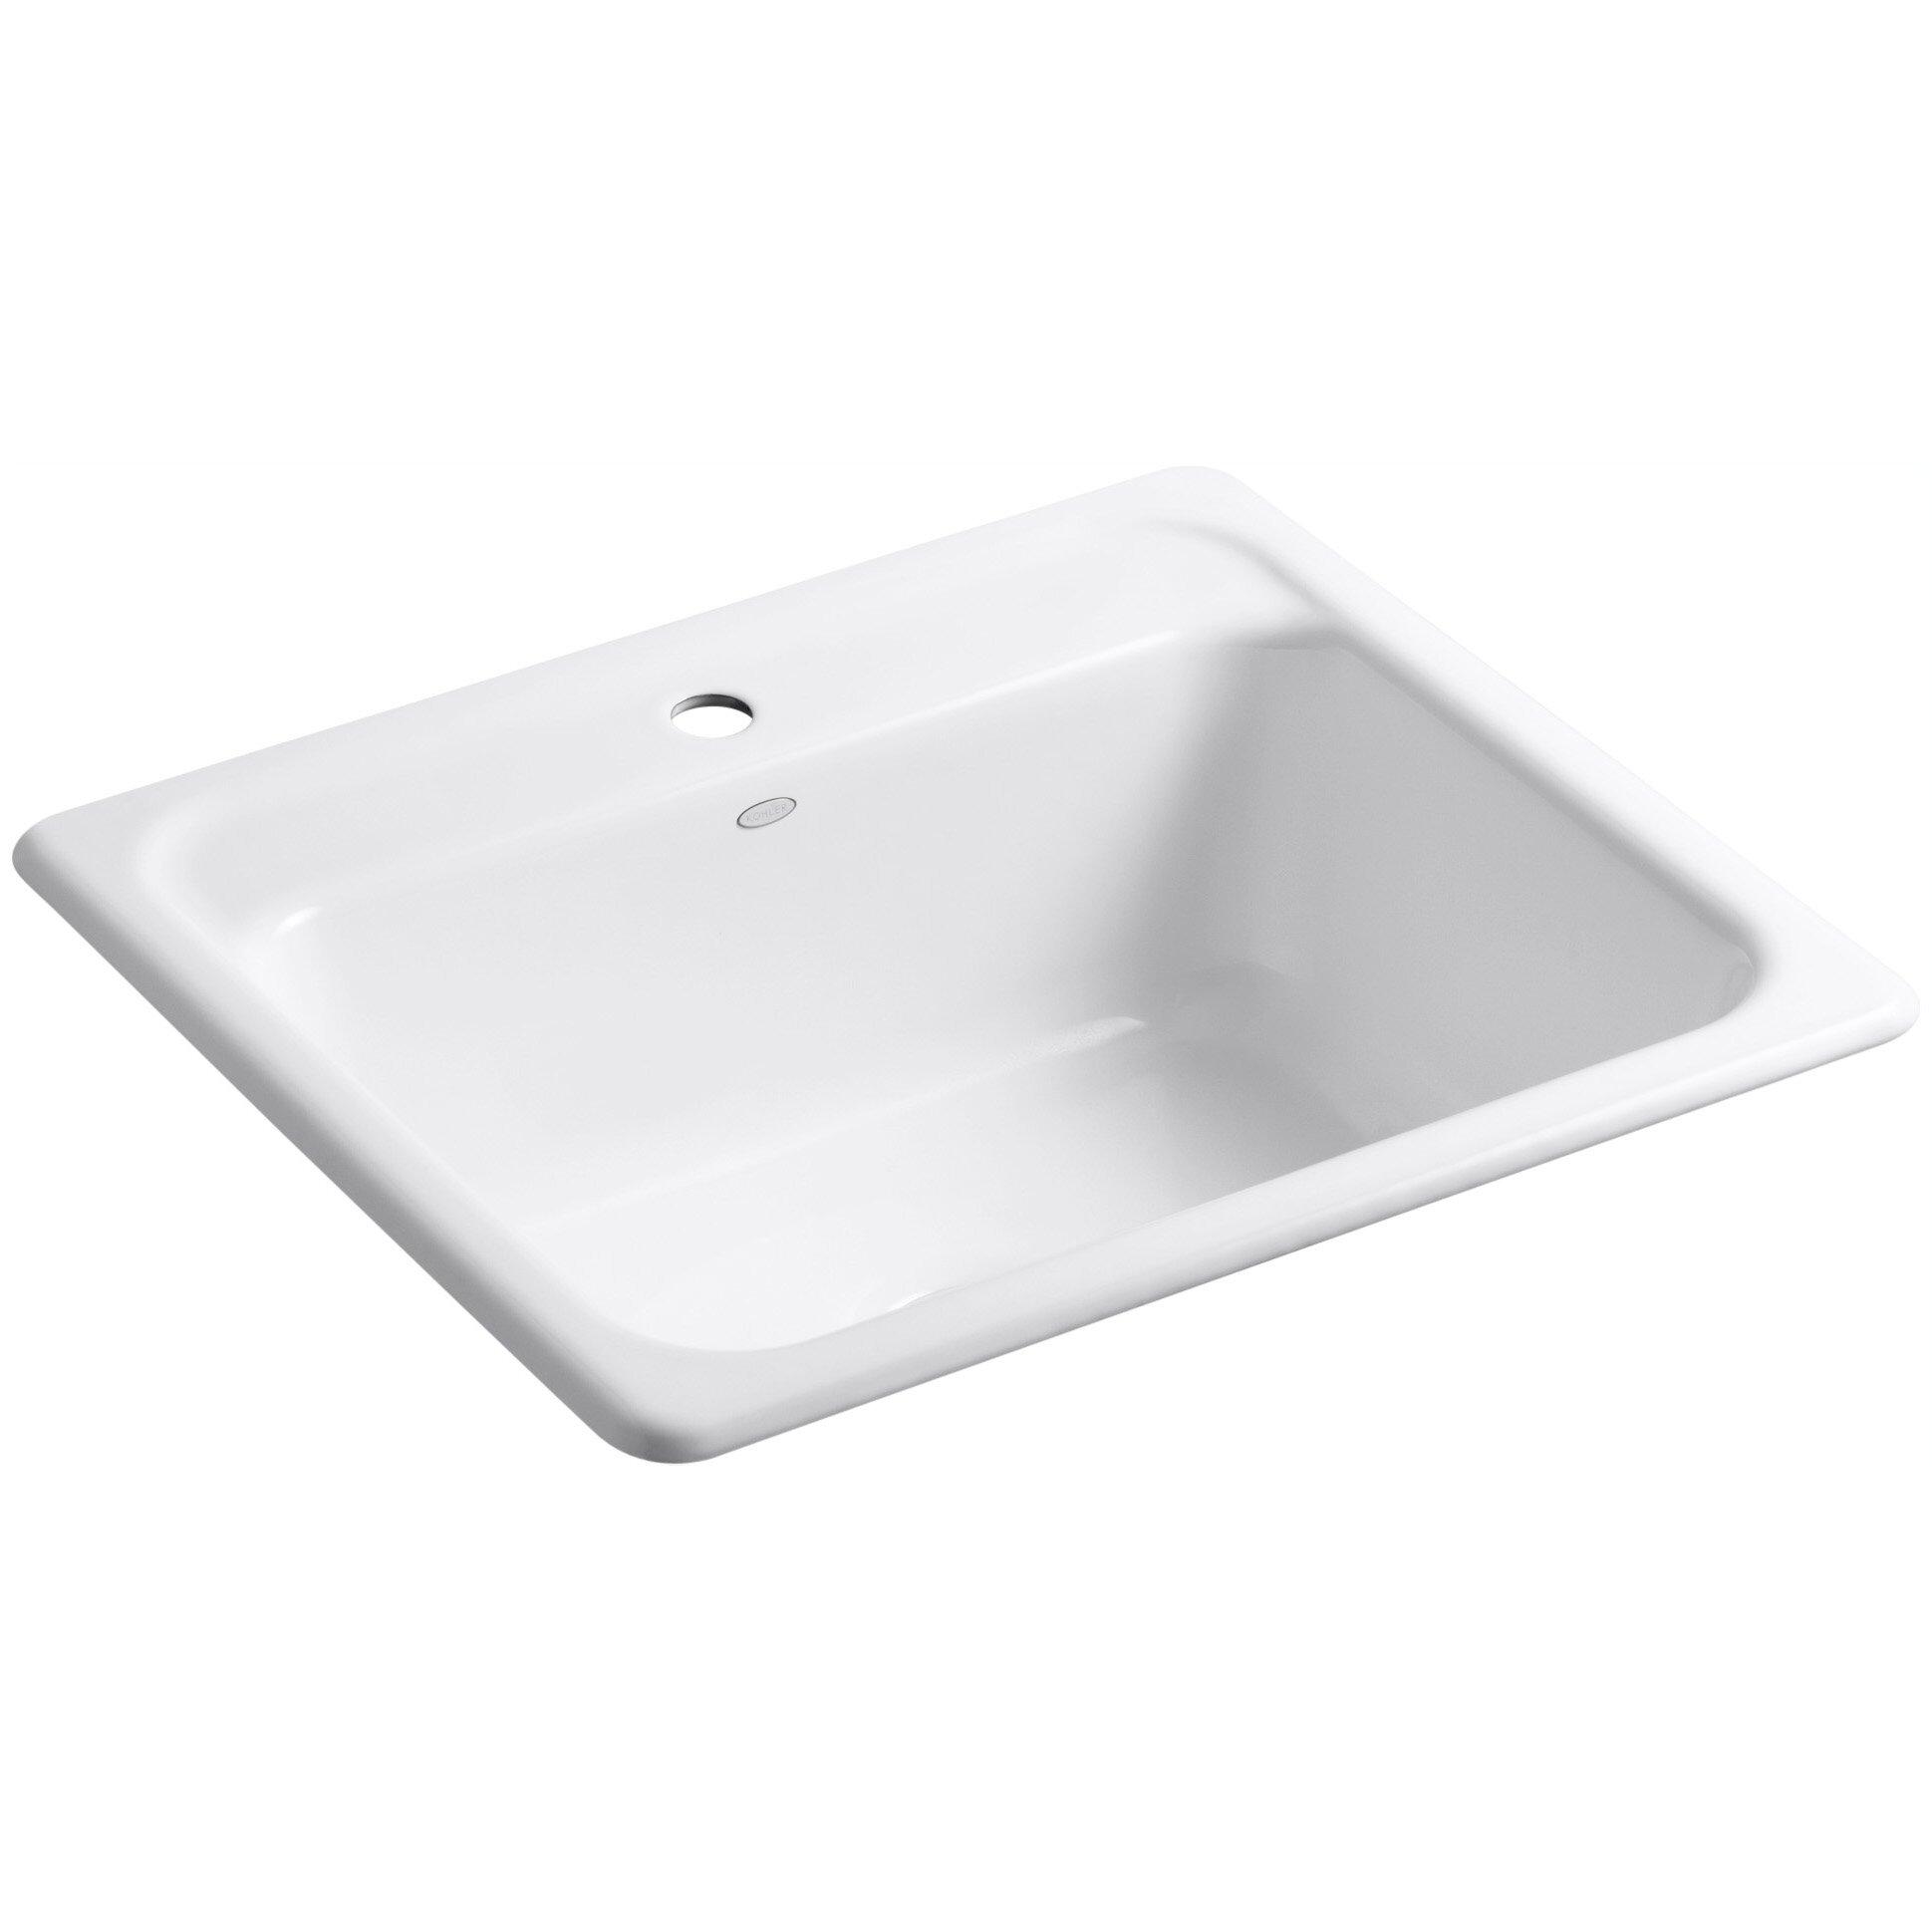 "Top Mount Sink Kitchen: Kohler Mayfield 25"" X 22"" X 8-3/4"" Top-Mount Single-Bowl"